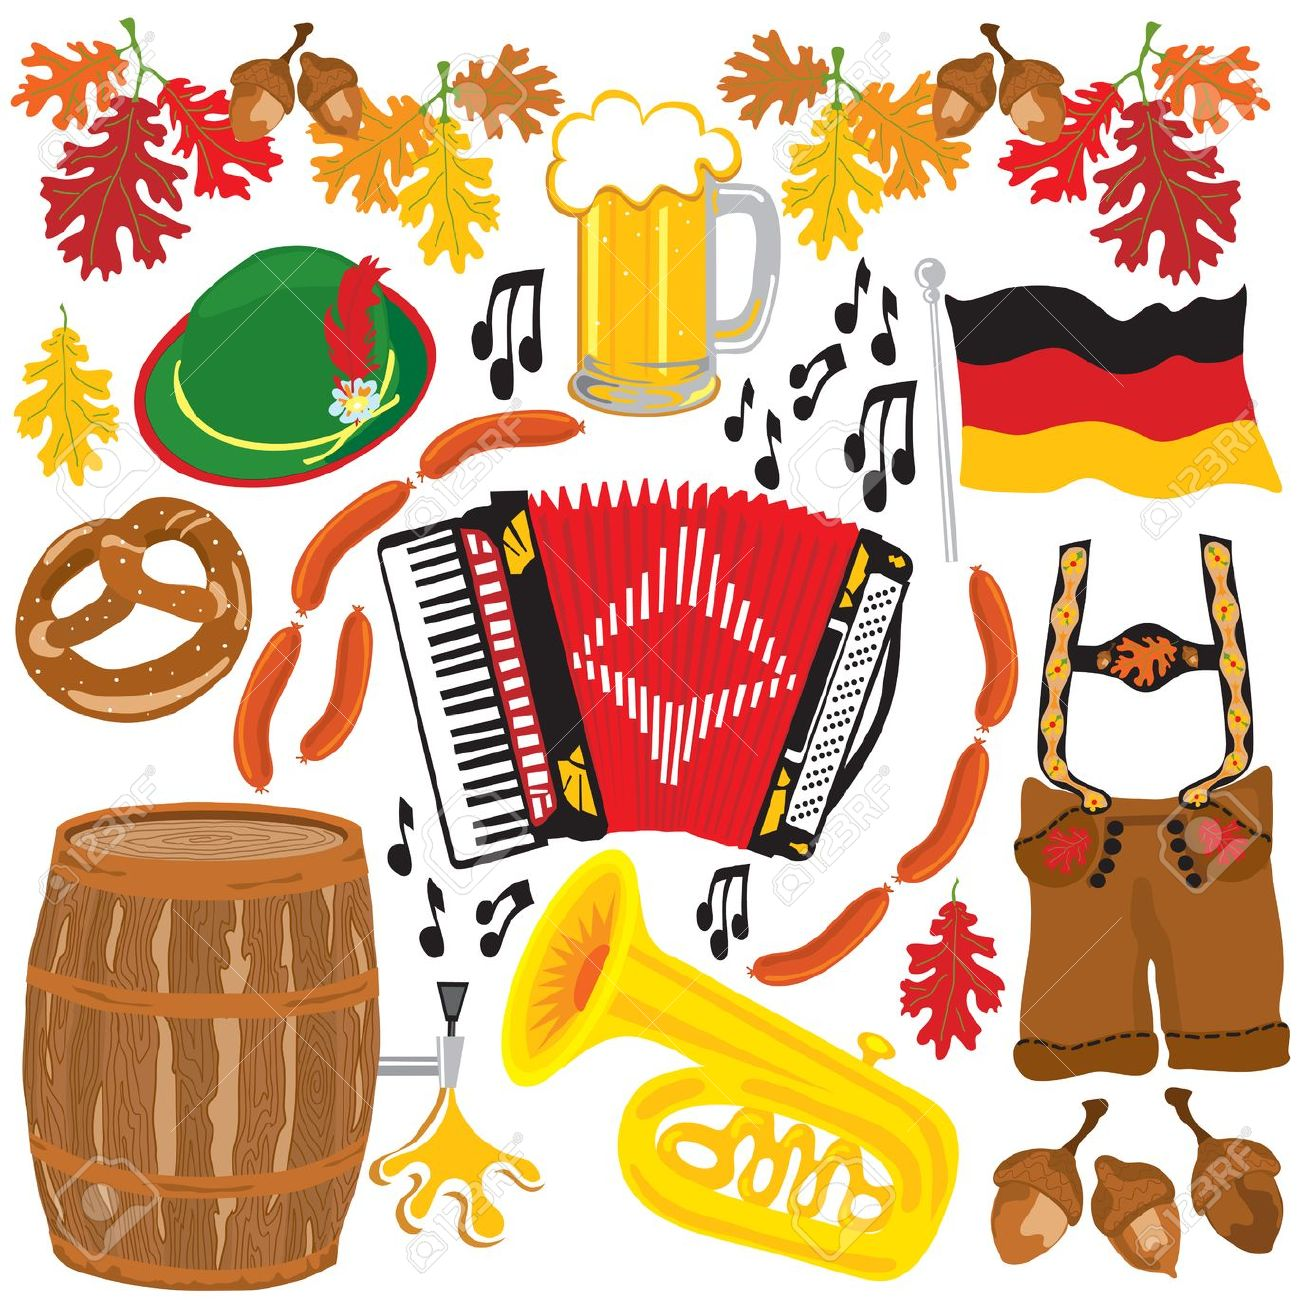 Germany Clip Art U0026middot; German Cli-Germany Clip Art u0026middot; german clipart-12